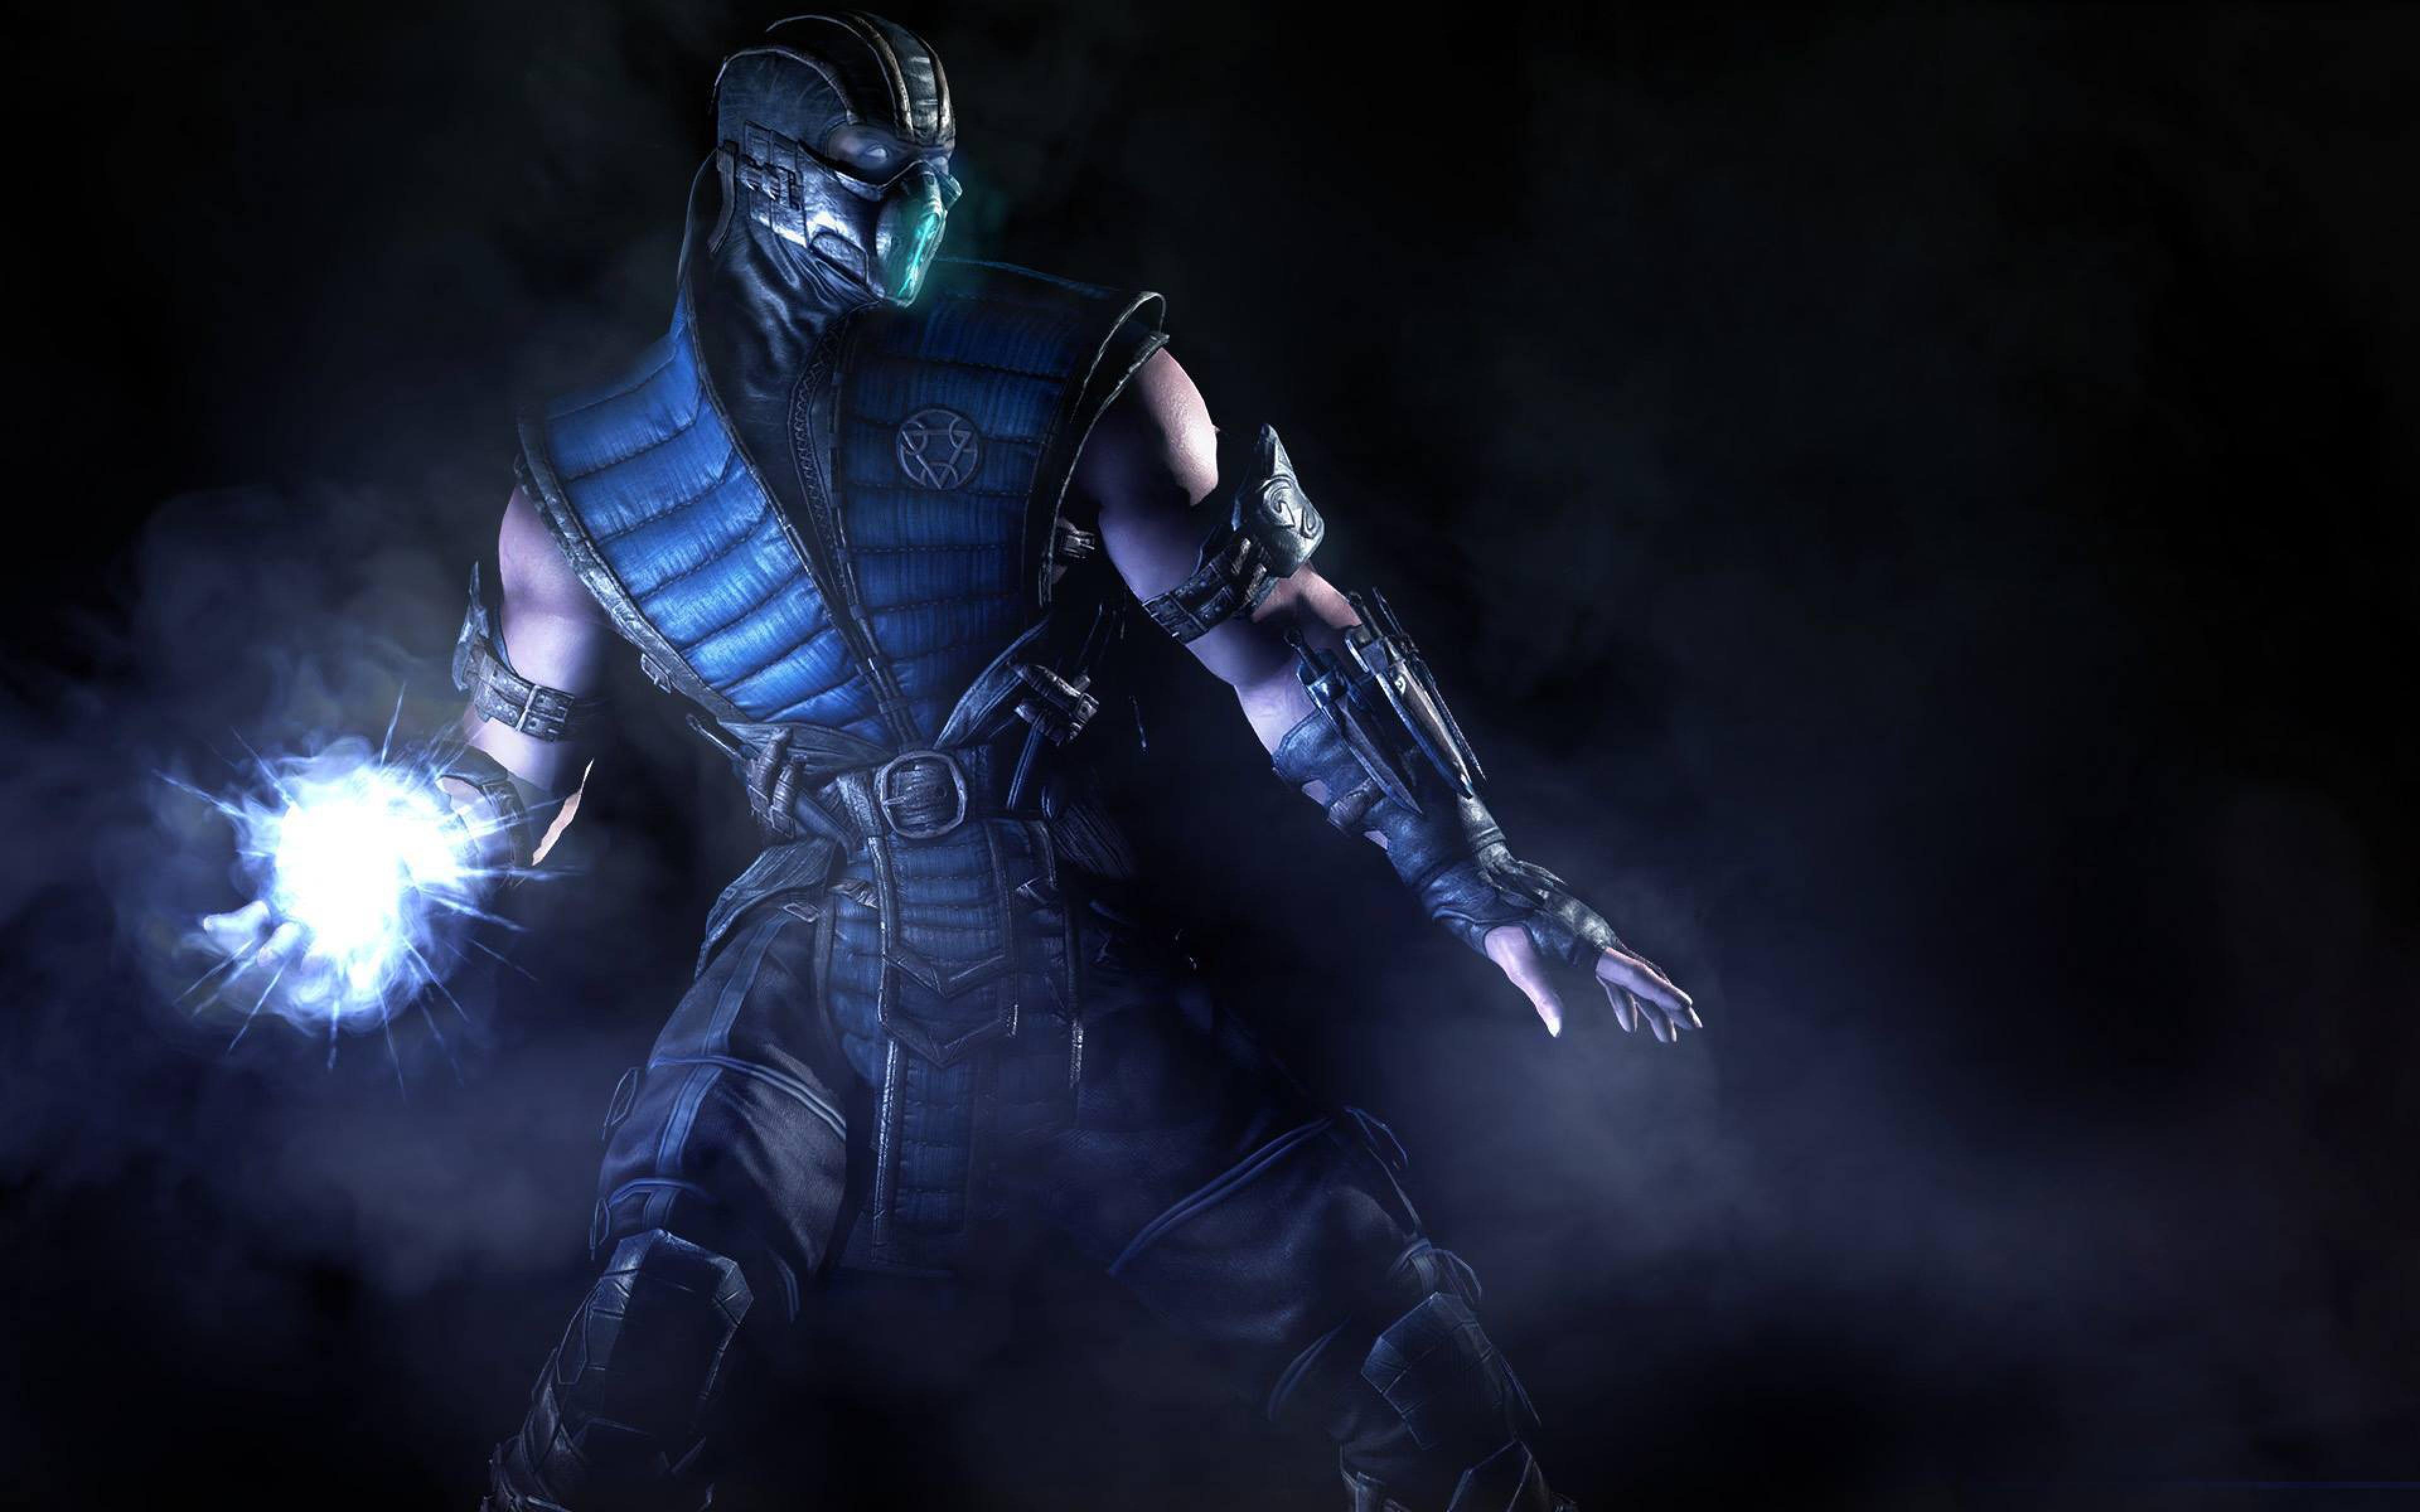 Mortal Kombat X High Quality Wallpapers